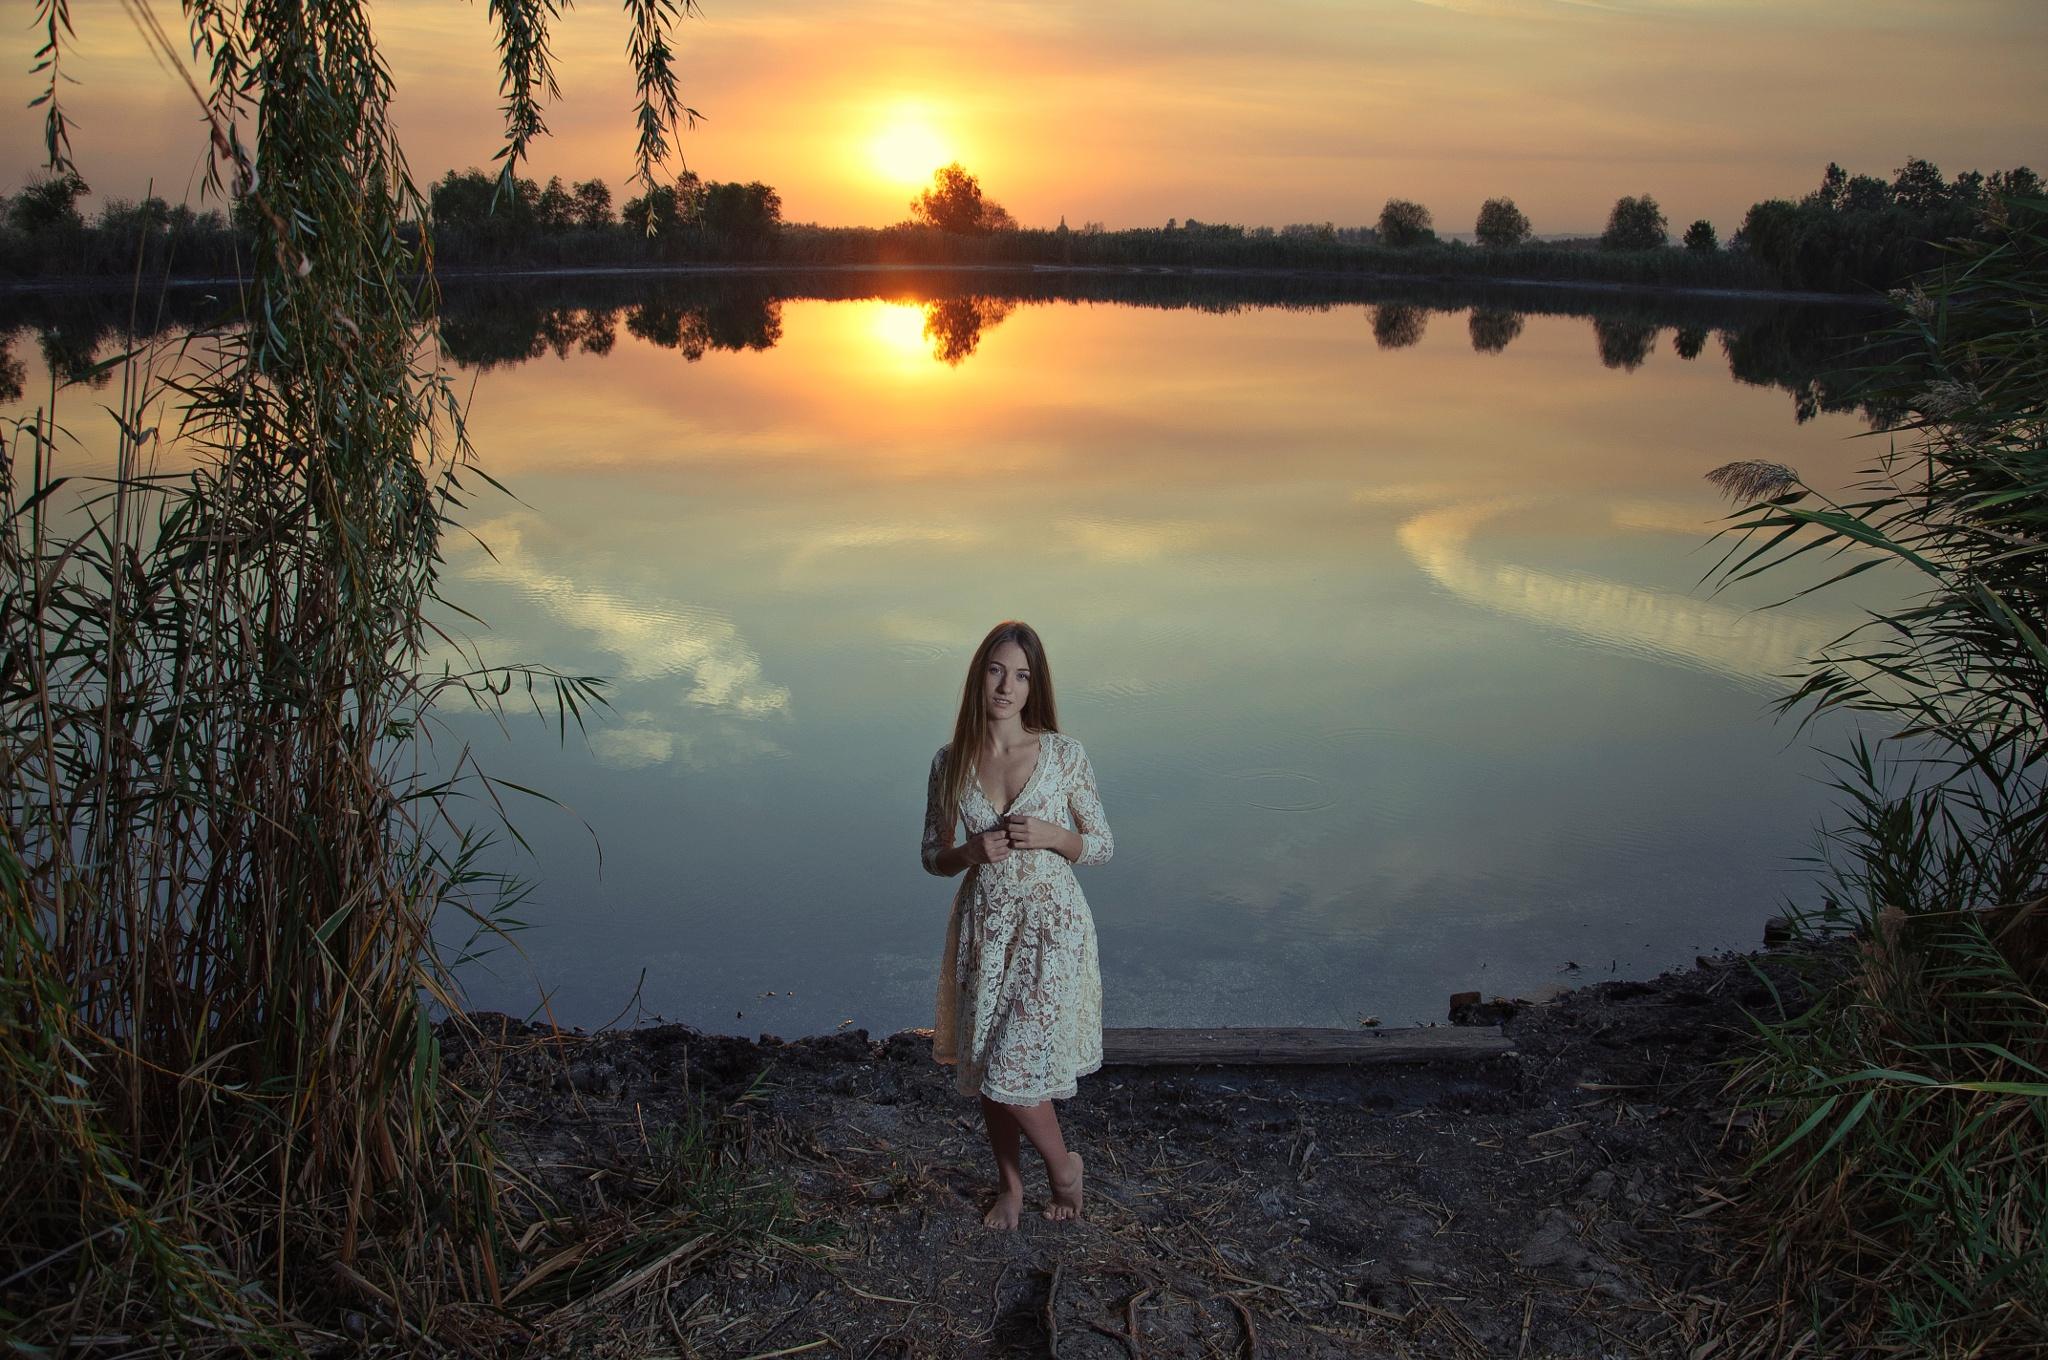 Veronika by Pavel Cherepko